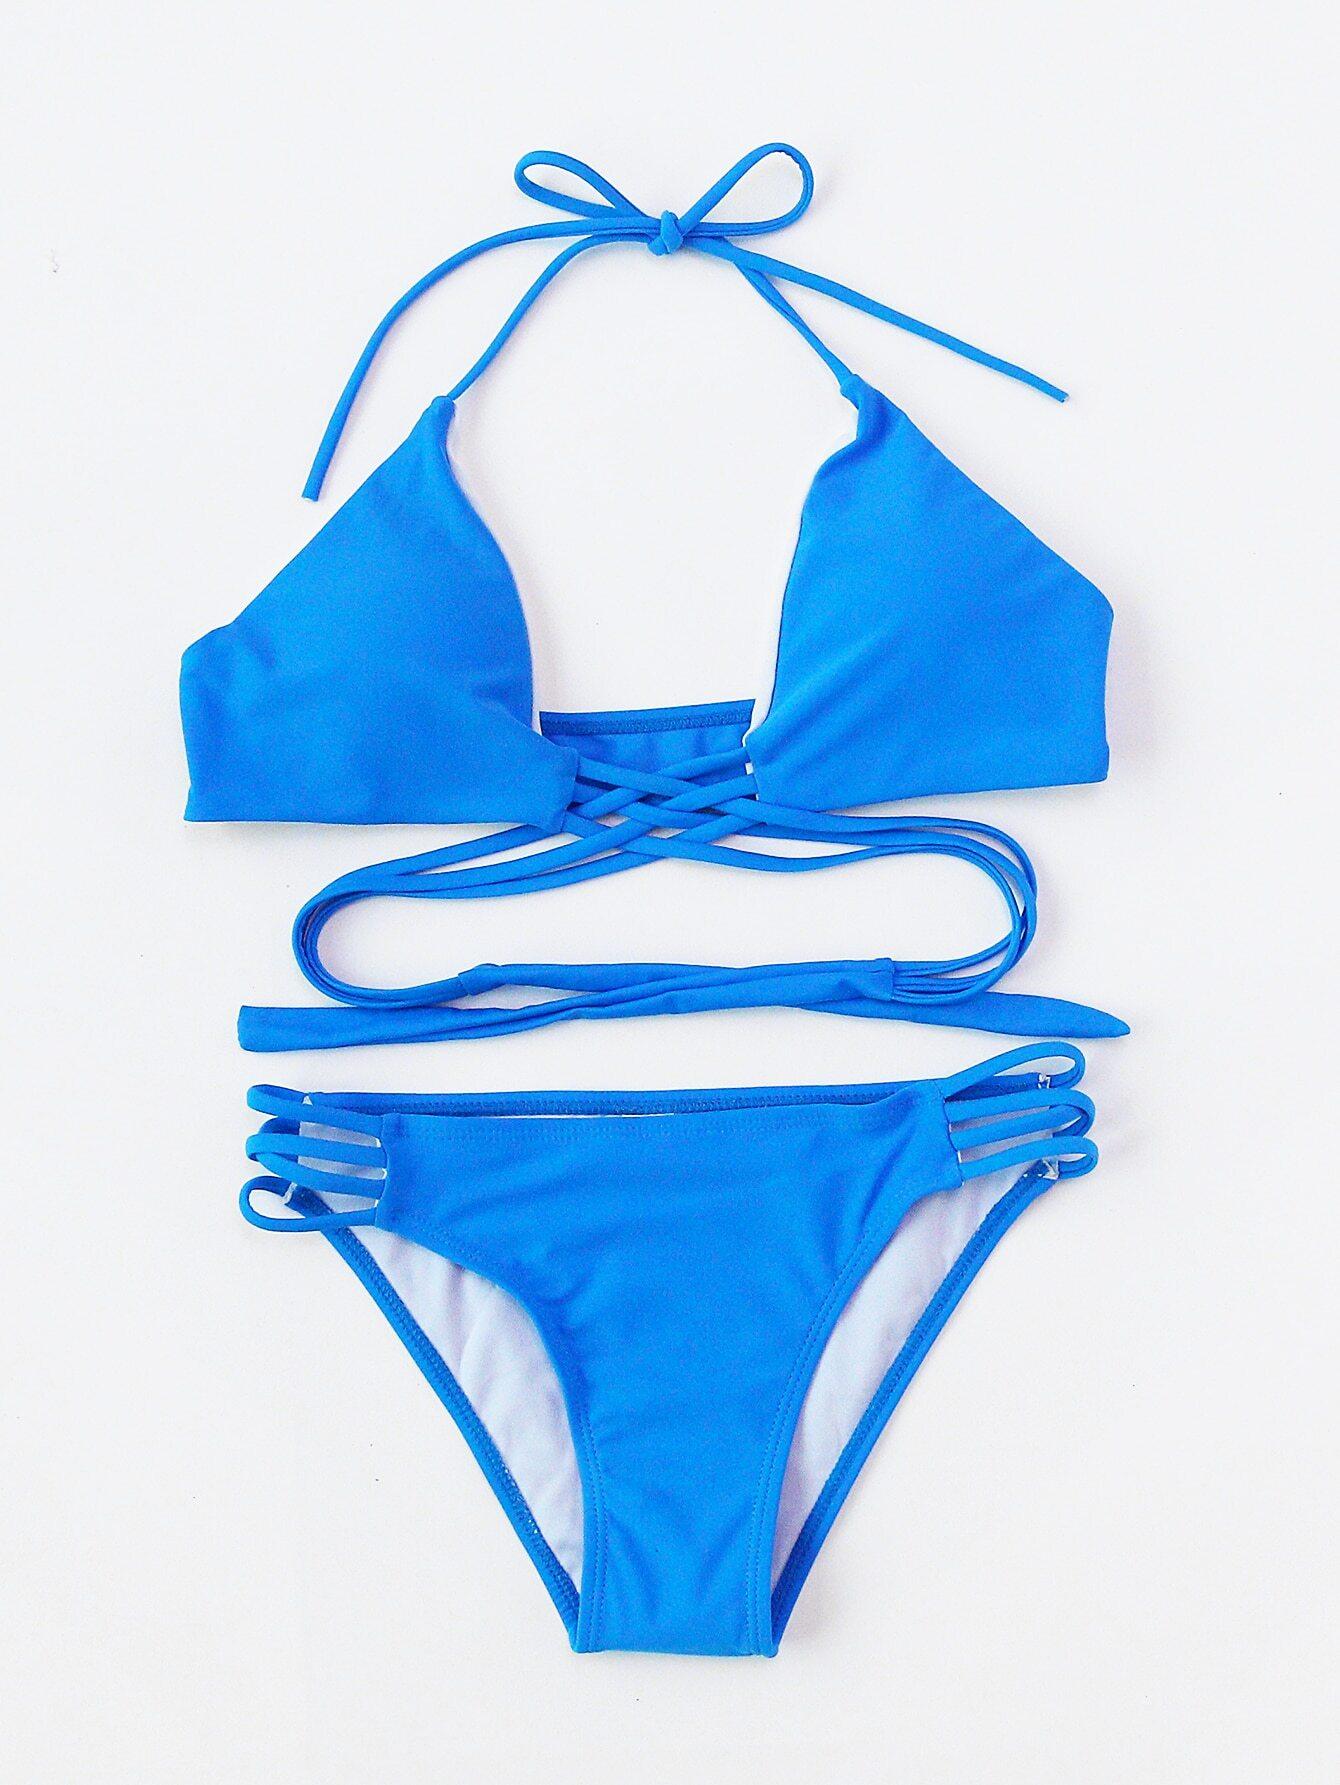 Ladder Cutout Criss Cross Bikini Set swimwear170417301